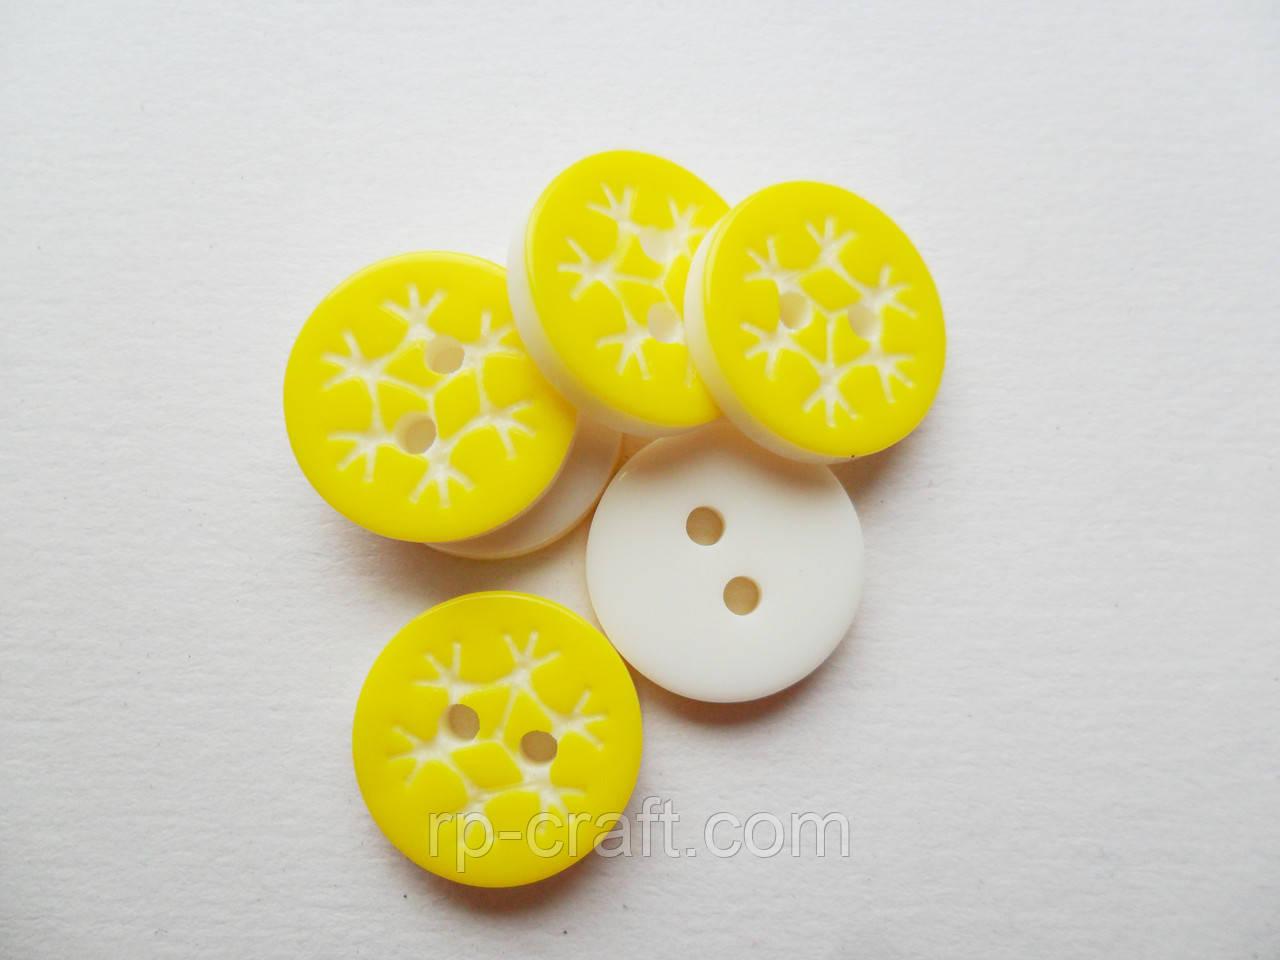 Пуговица пластиковая, декоративная. Снежинка на желтом фоне